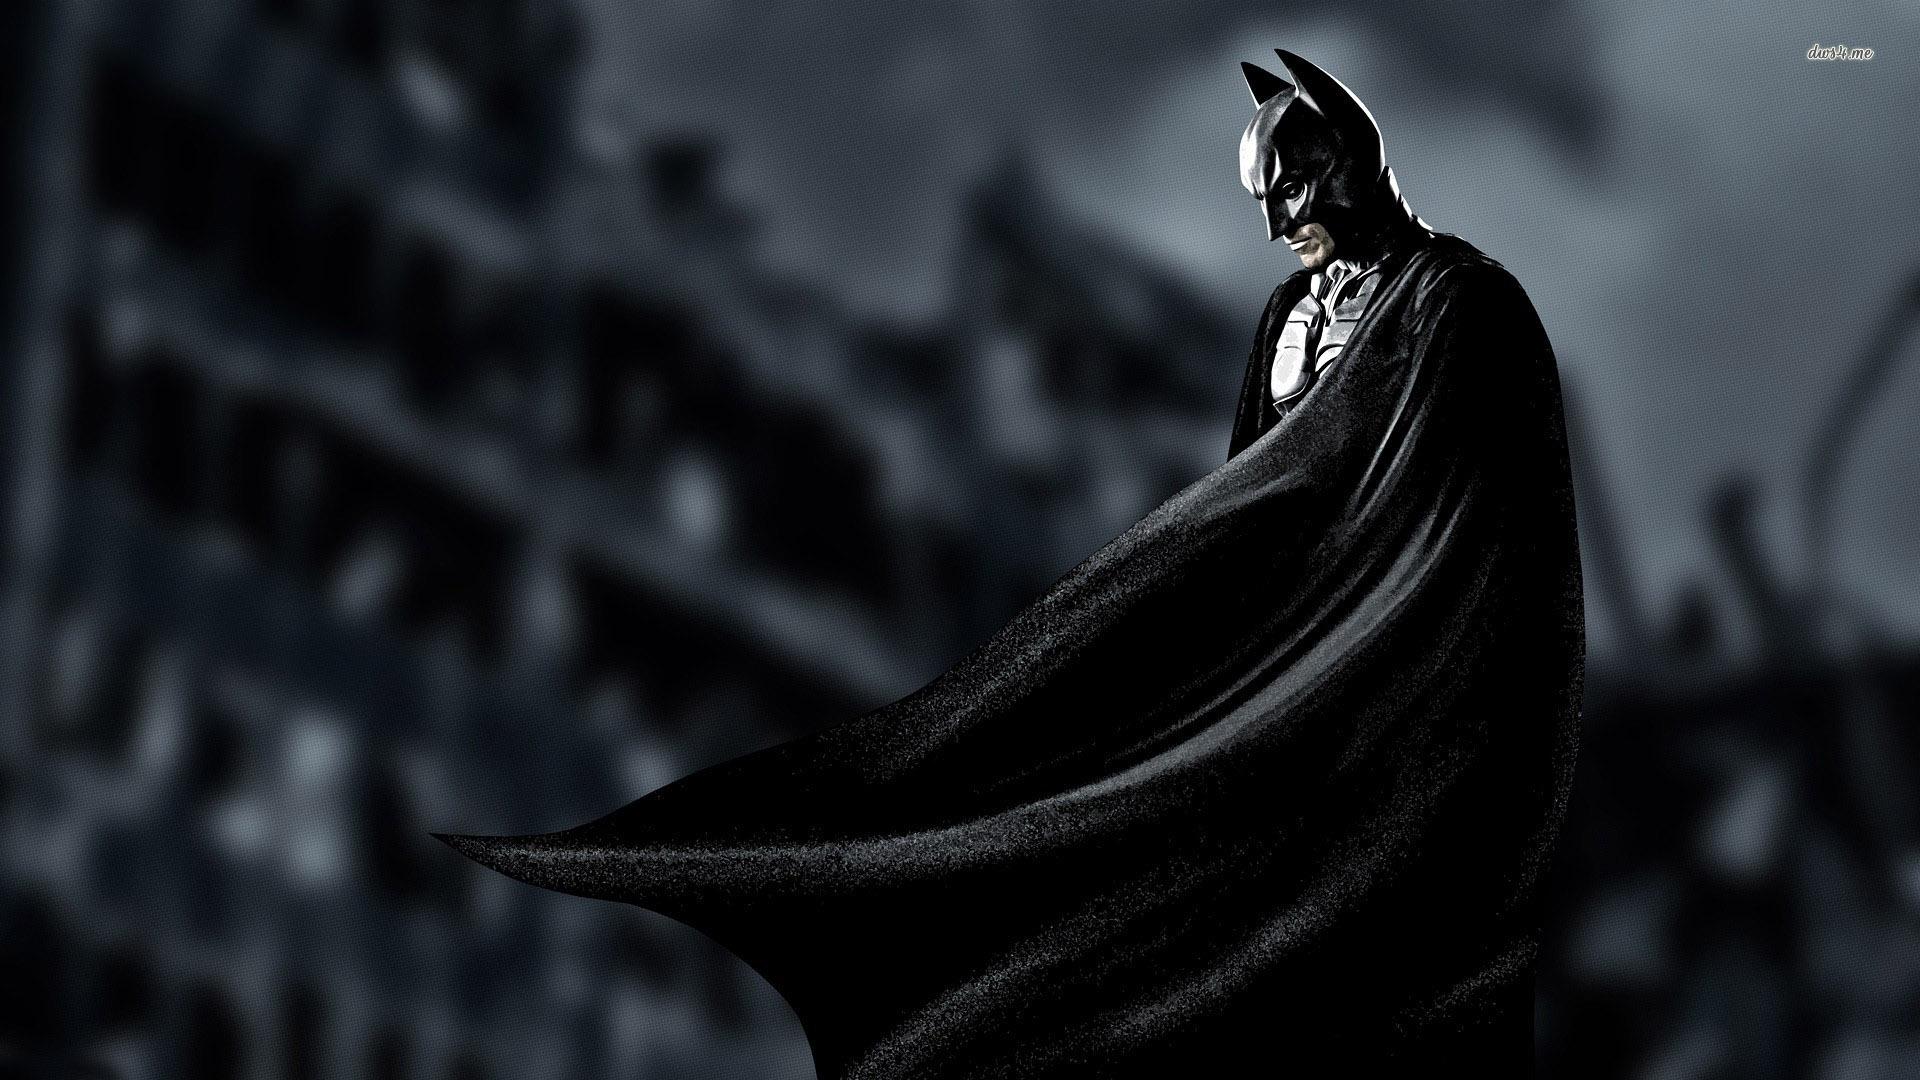 Batman wallpaper 1280x800 Batman wallpaper 1366x768 Batman wallpaper 1920x1080